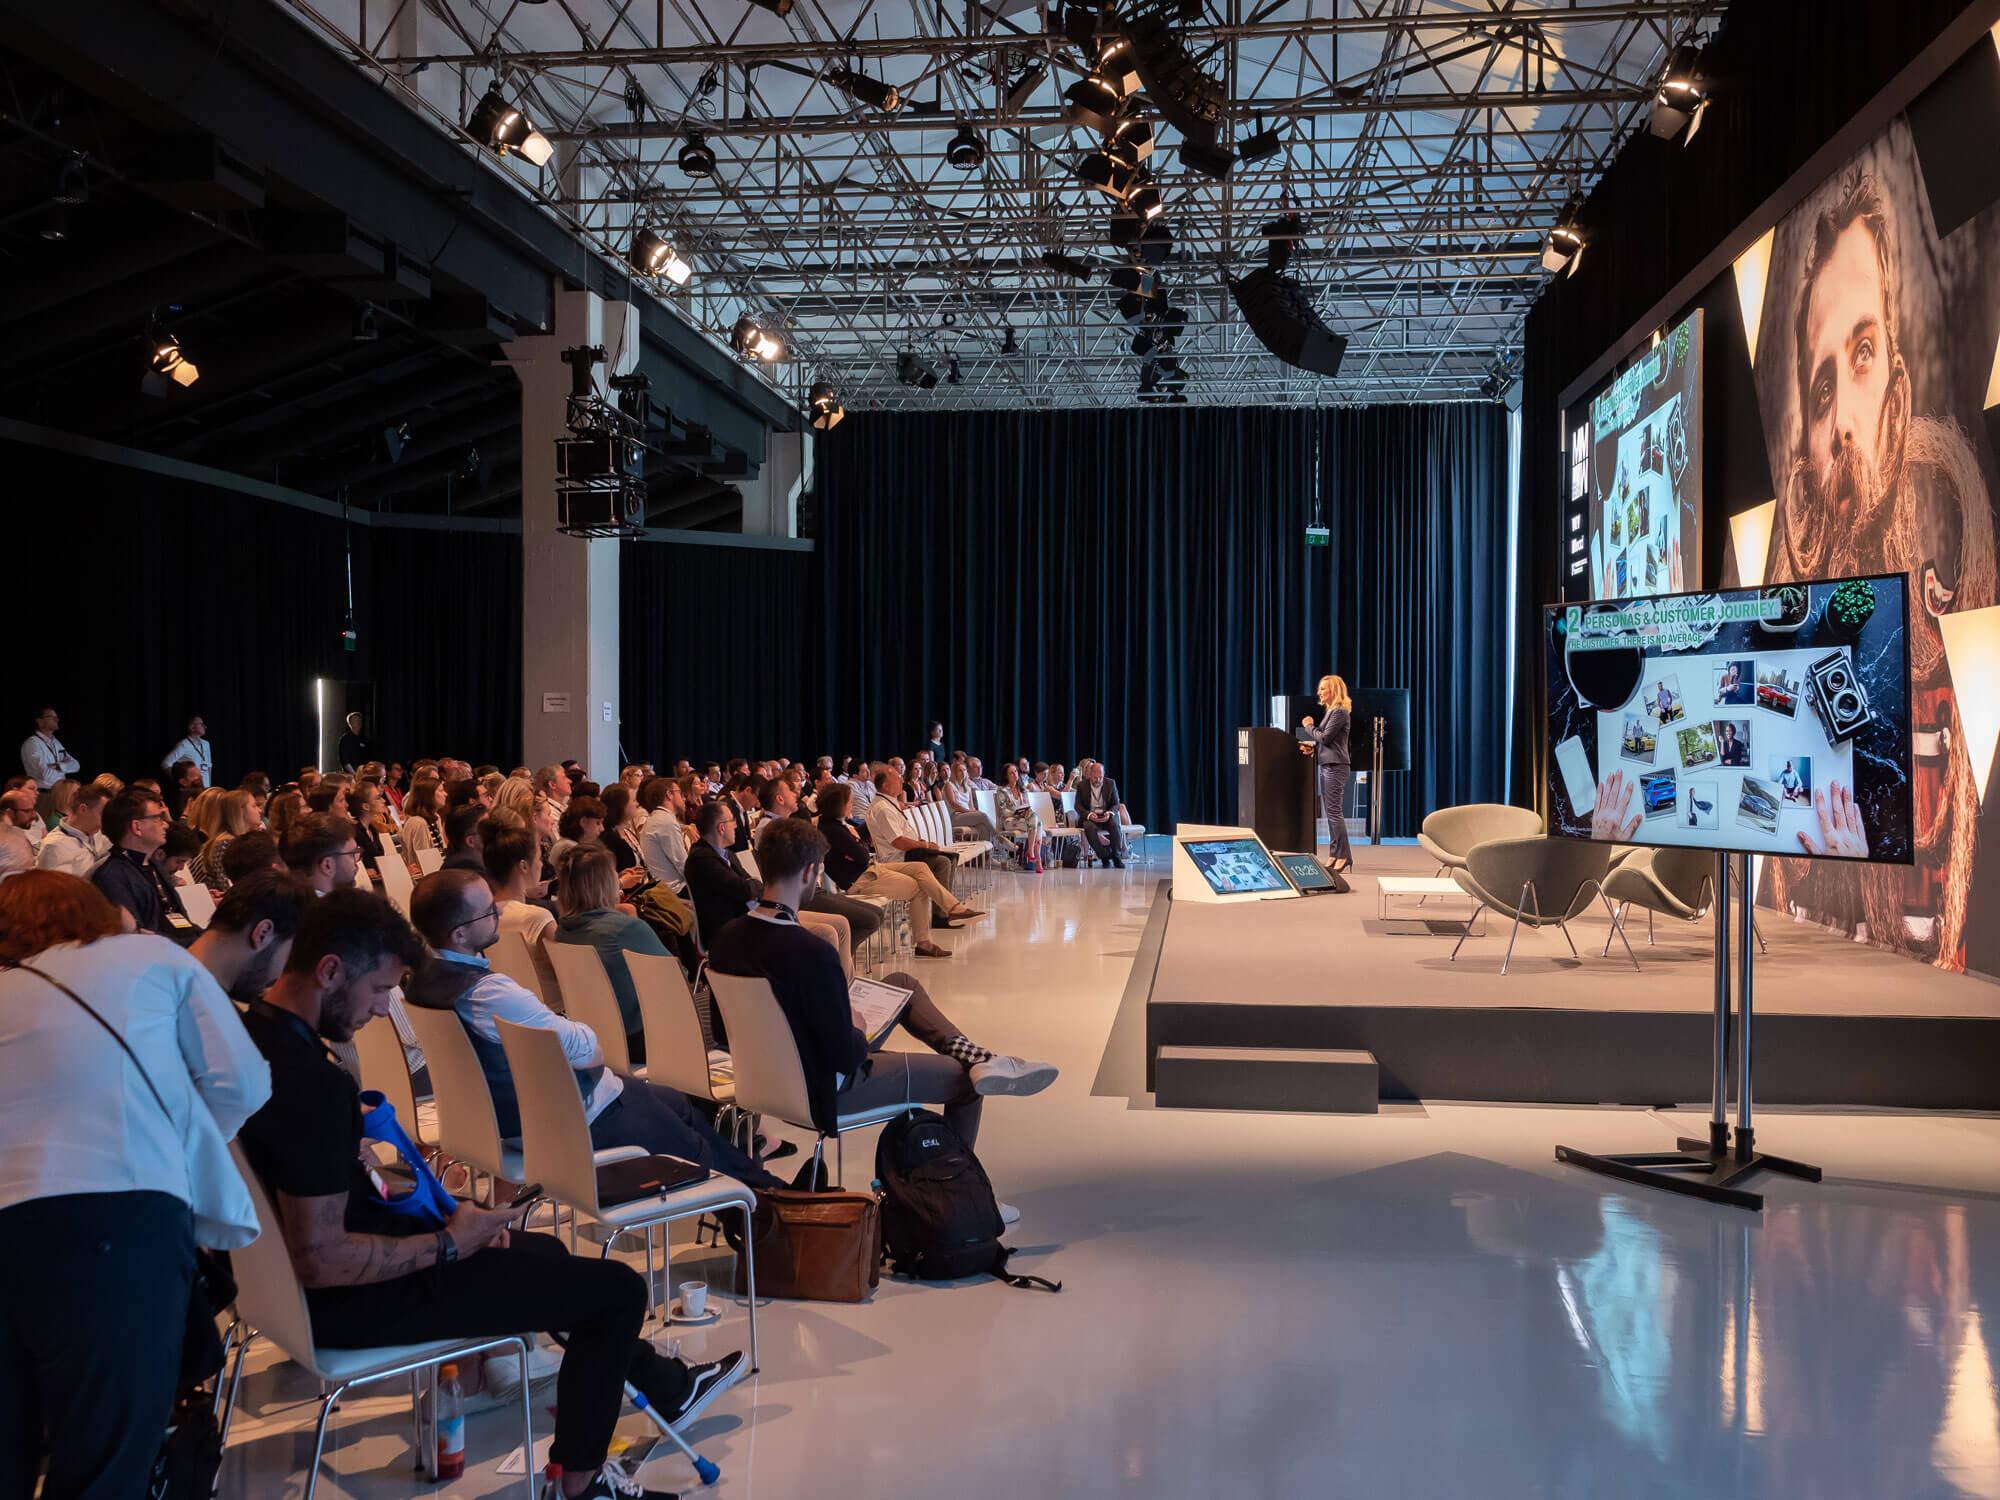 ziegelei101 innenansicht Loft 7 Bühne Präsentation firmenevent kick off firmenveranstaltung